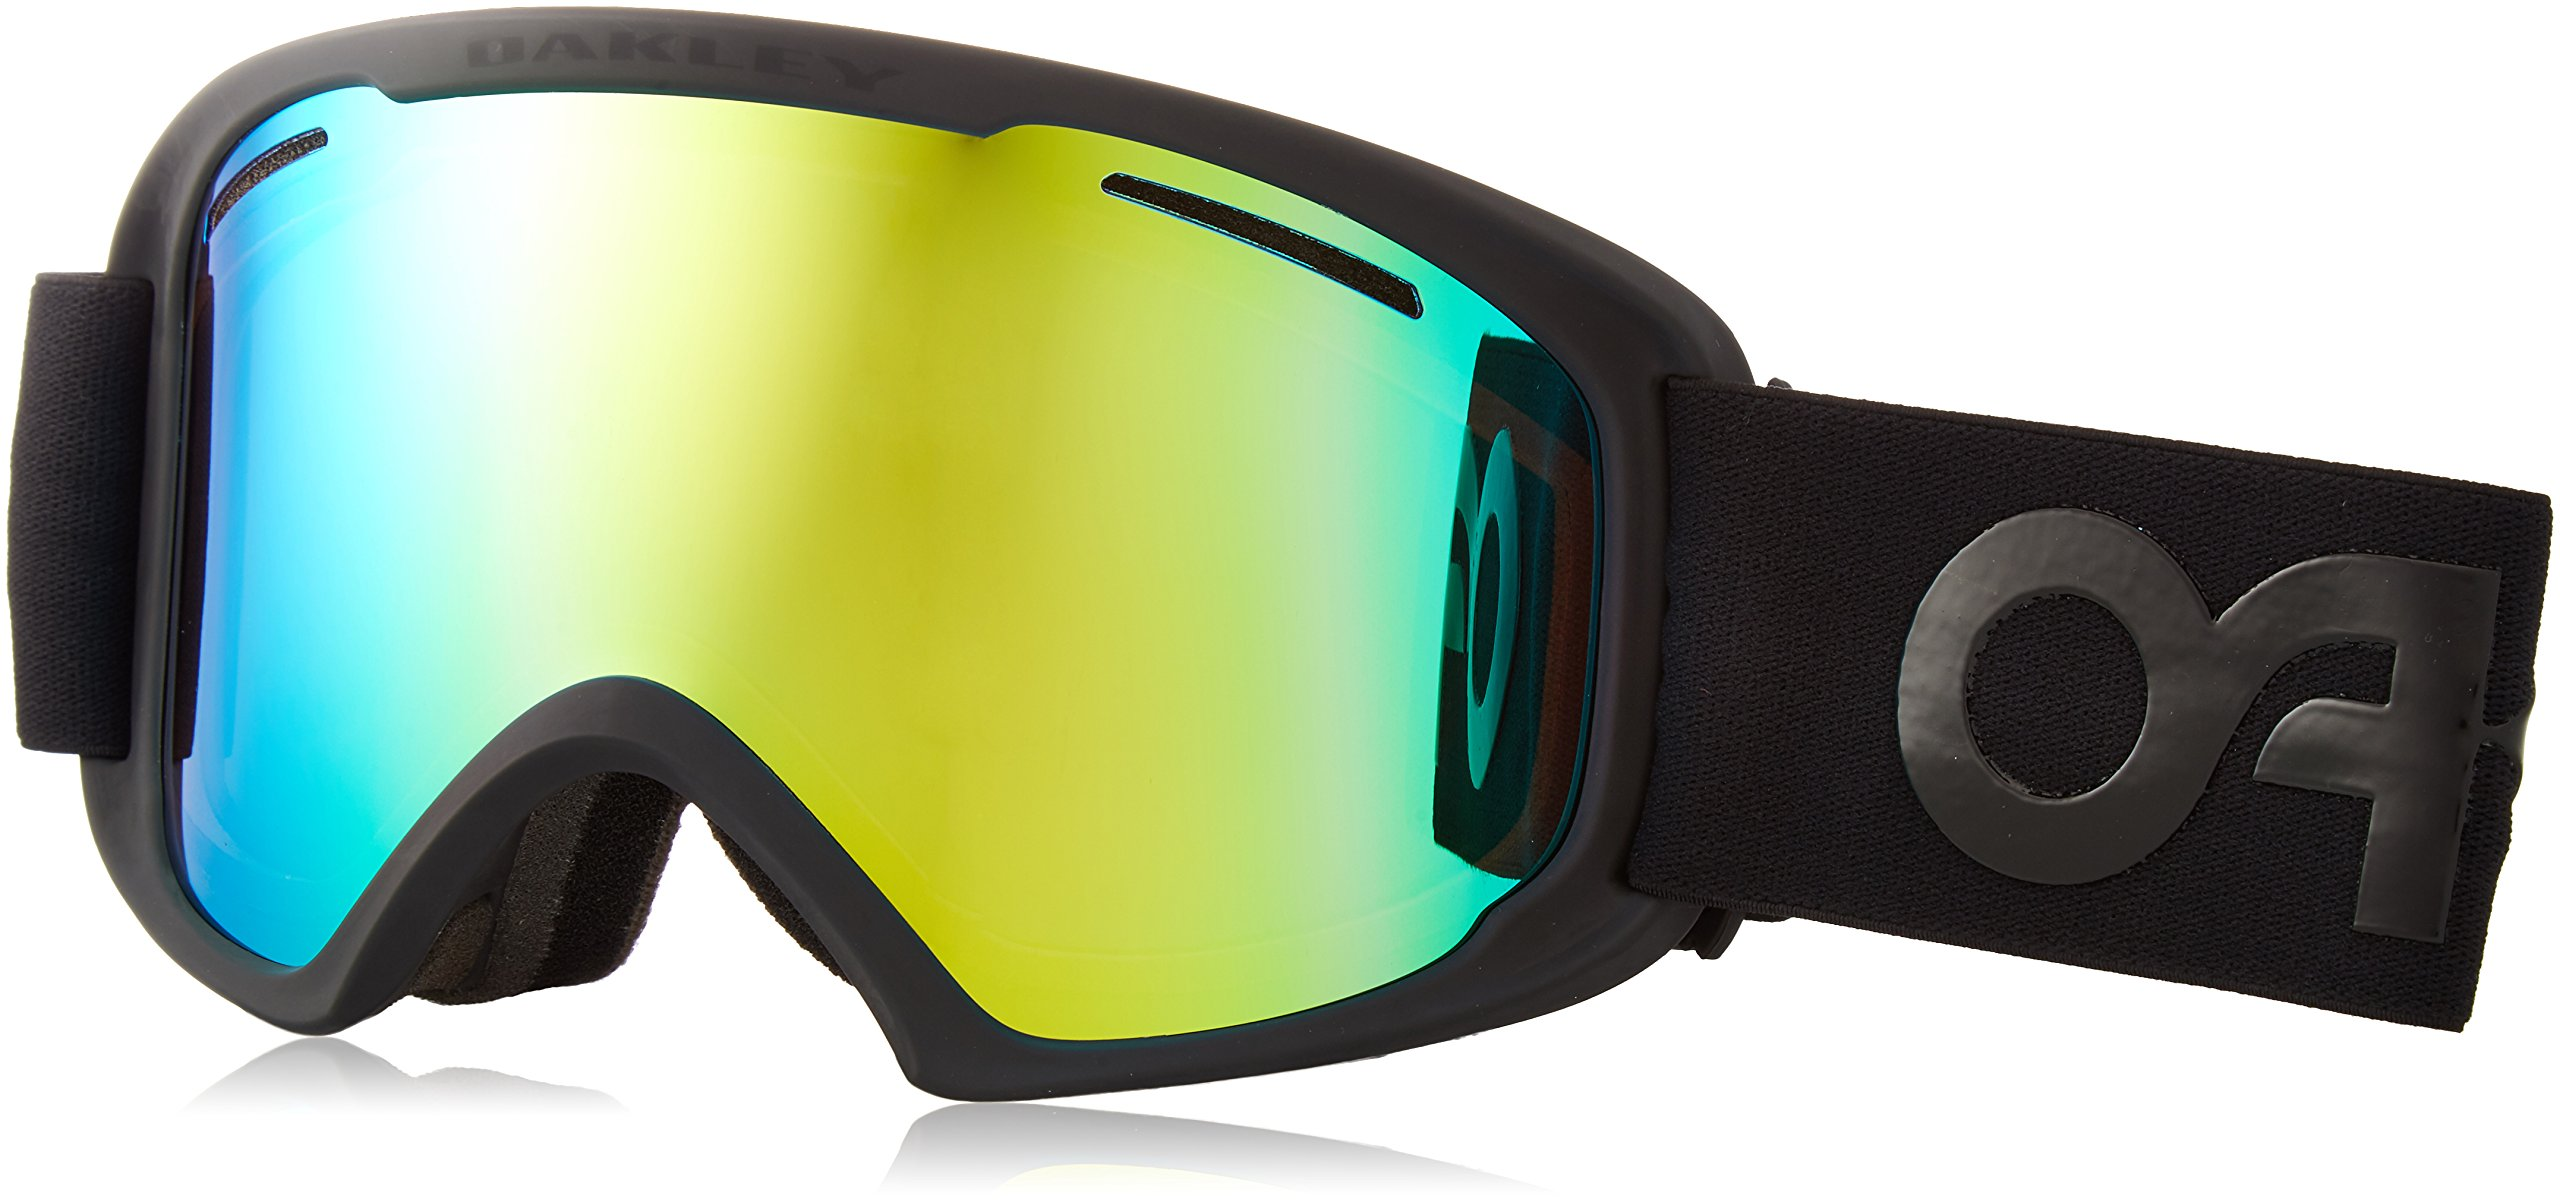 Oakley OO7045-07 O2 XL Eyewear, Factory Pilot Blackout, Jade Iridium Lens